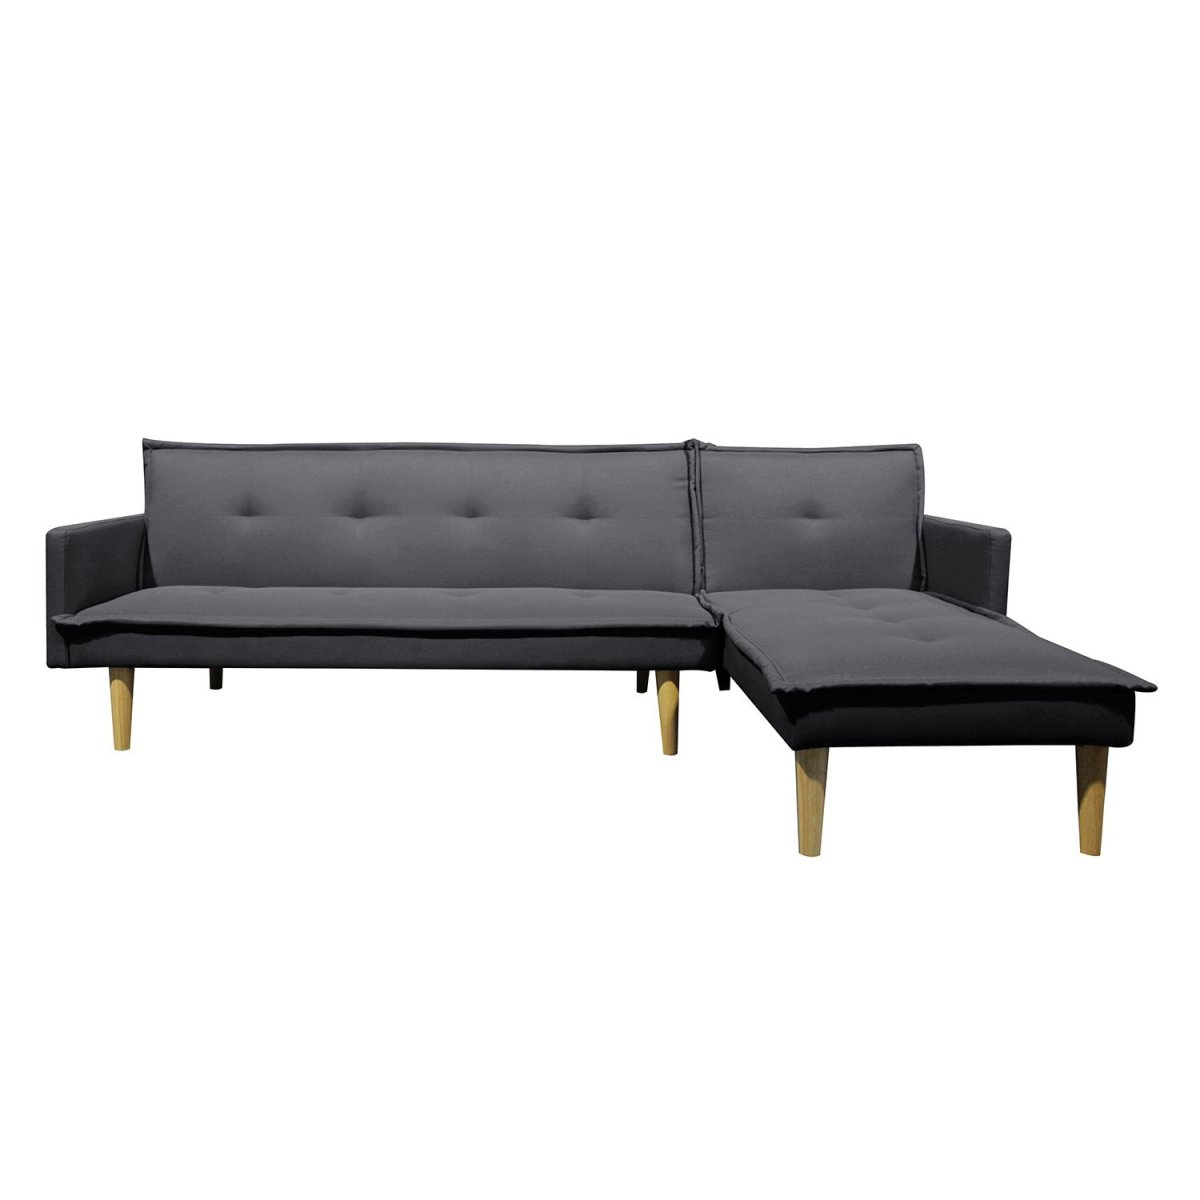 sala esquinada sofá cama independencia gris 4